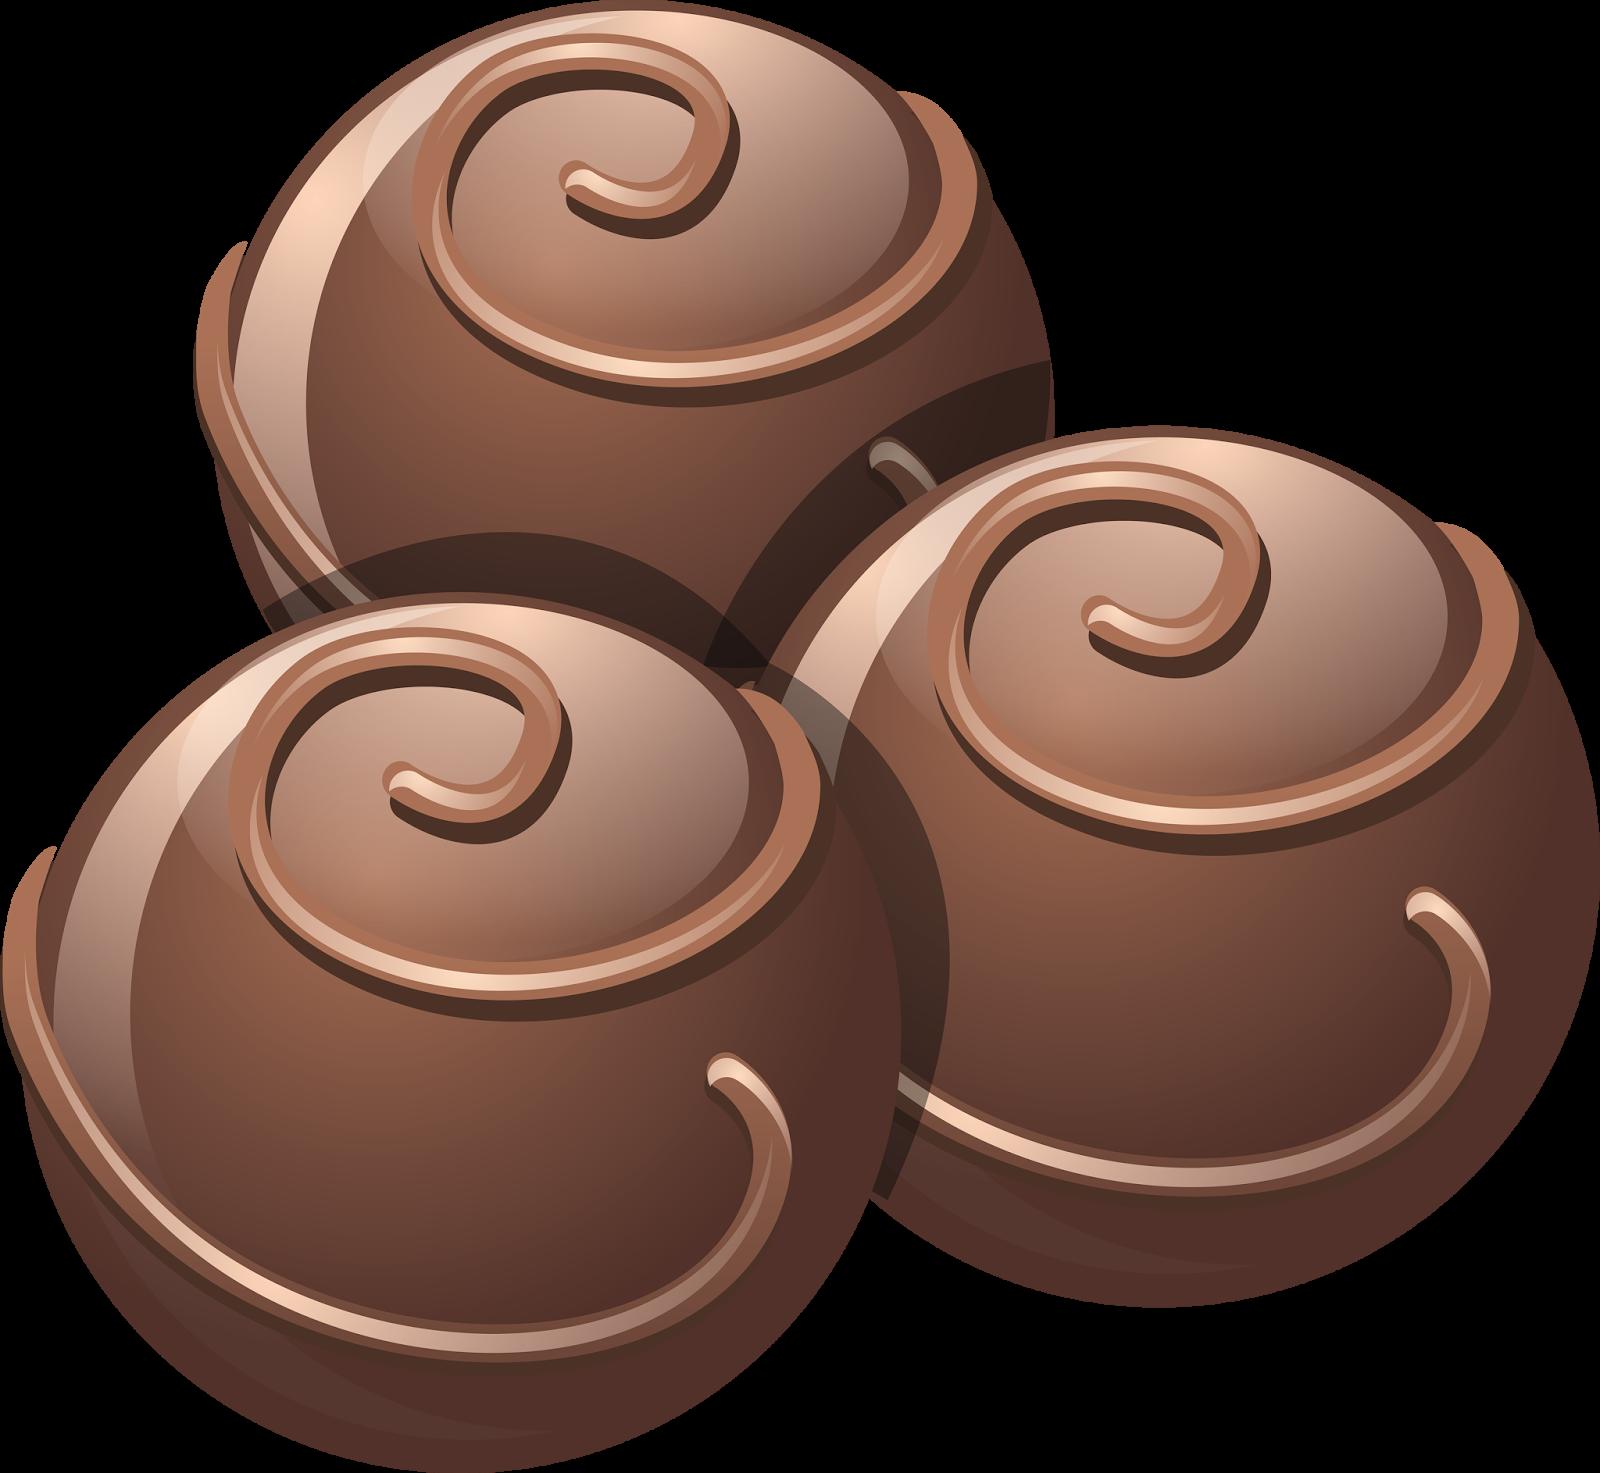 Clipart candy choco balls. Chocolate truffle bar hot